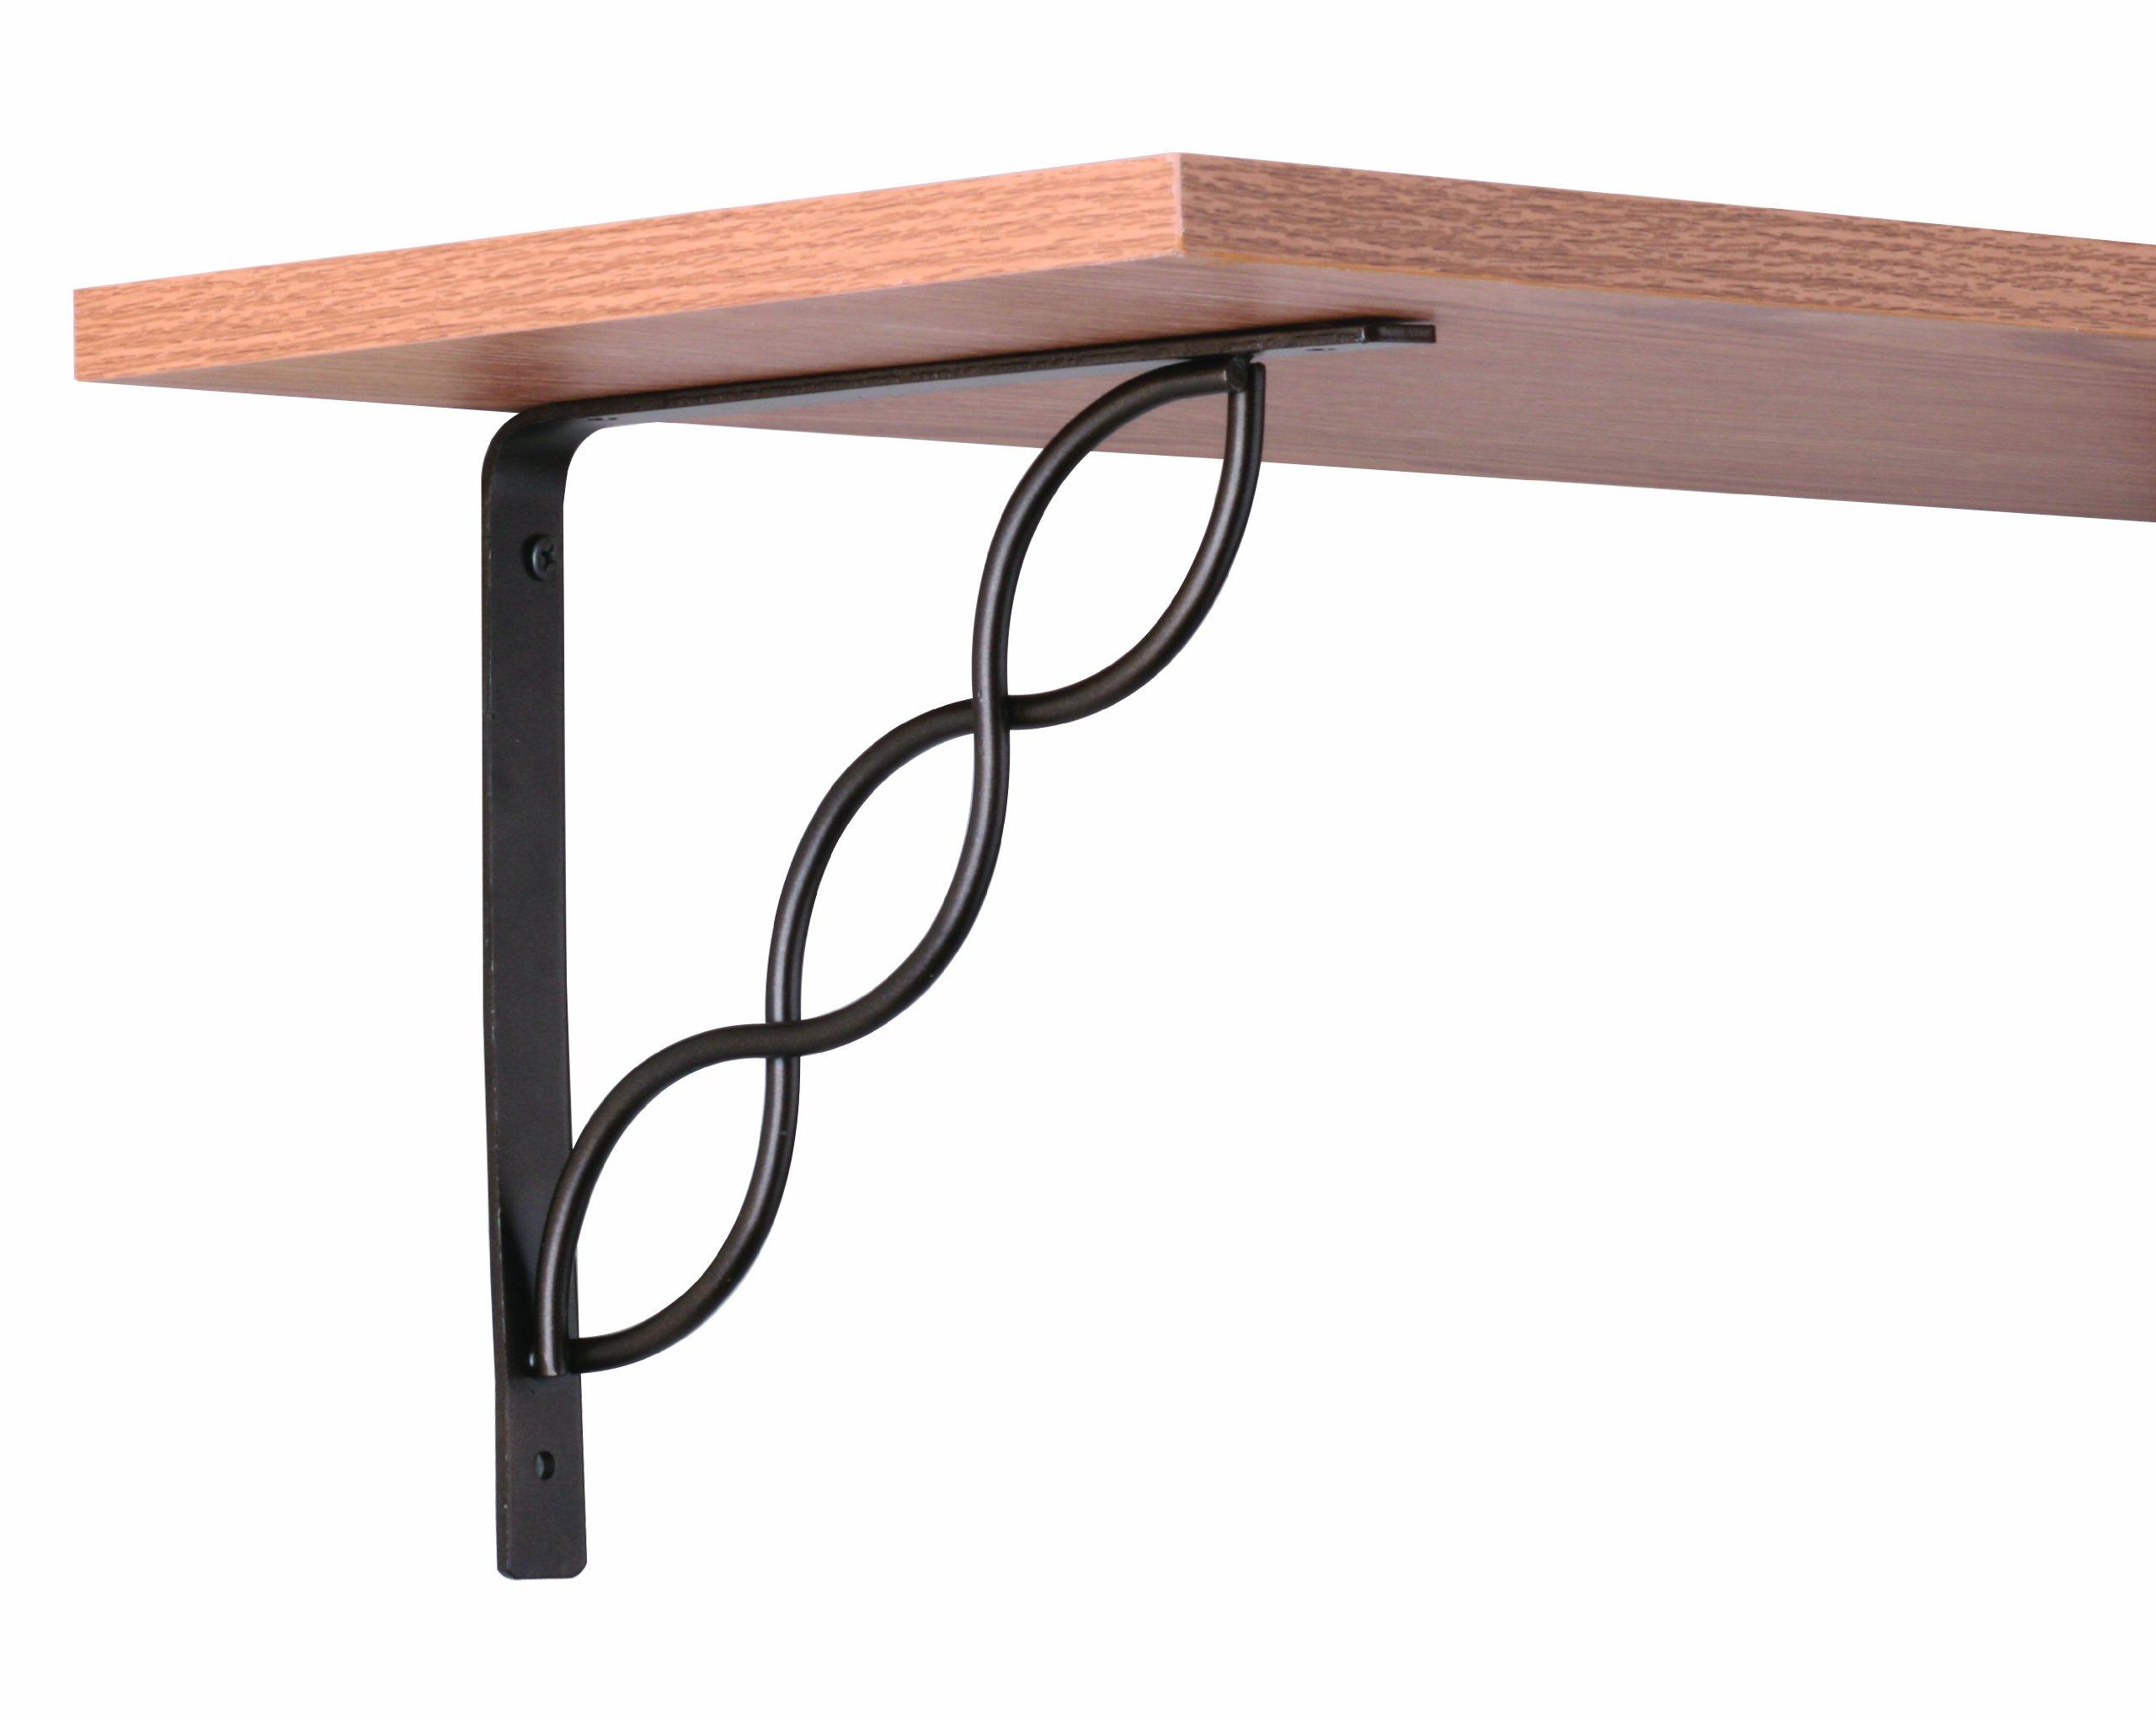 John Sterling Scroll Style Decorative Shelf Bracket, 8-inch, Bronze, RP-0091-8BRZ